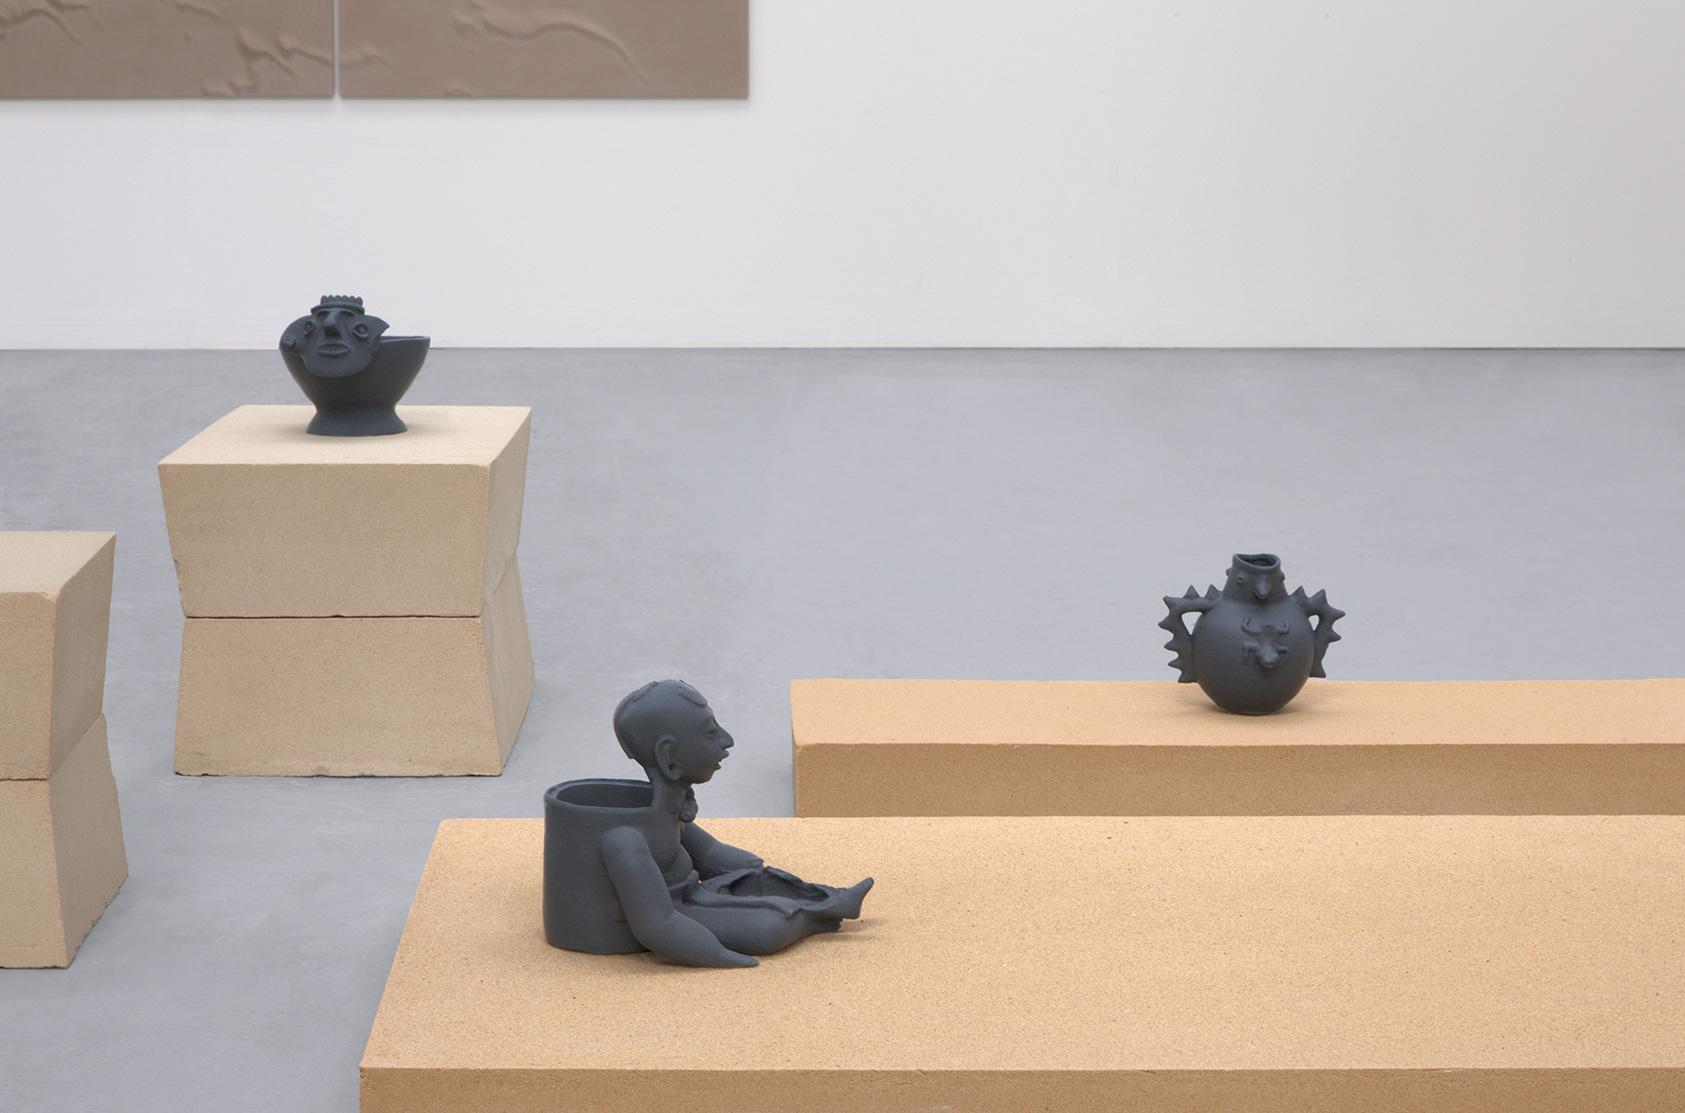 Andrea Zucchini, terra terra, 2015. 3D printed replicas of Mesoamerican artefacts, sand.